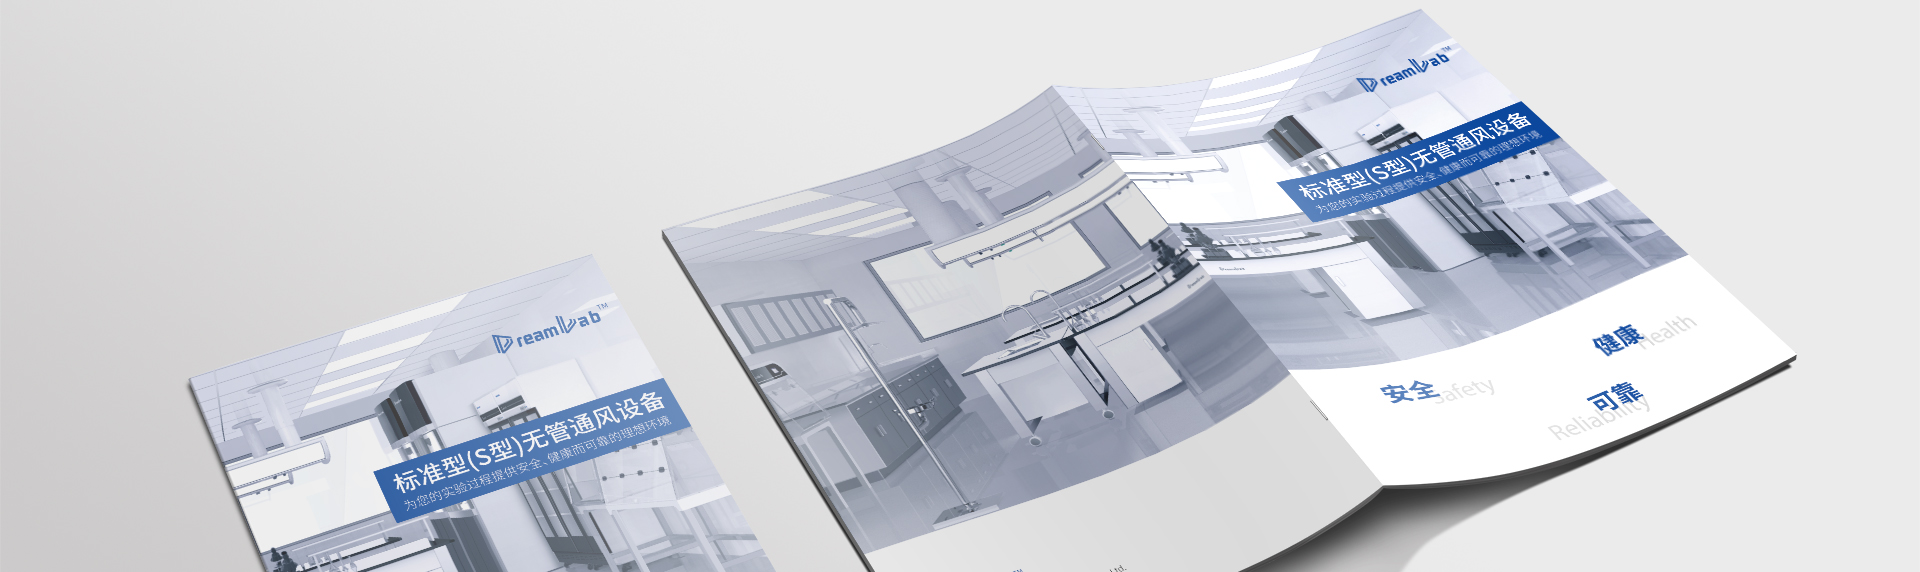 SSC设计-君勒�铂画册设计